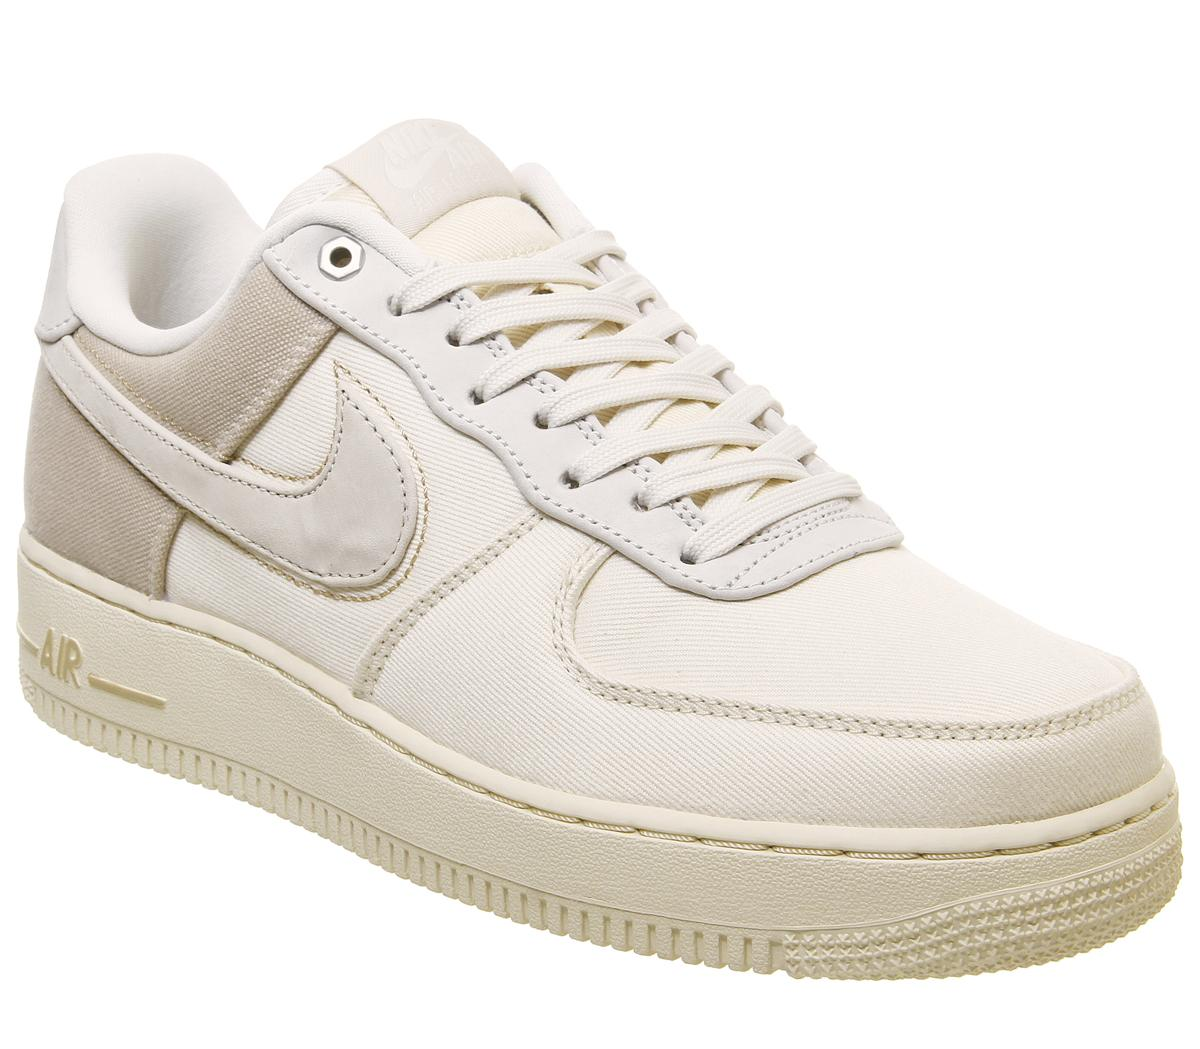 Nike Air Force 1 07 Pale Ivory Light Cream Desert Ore